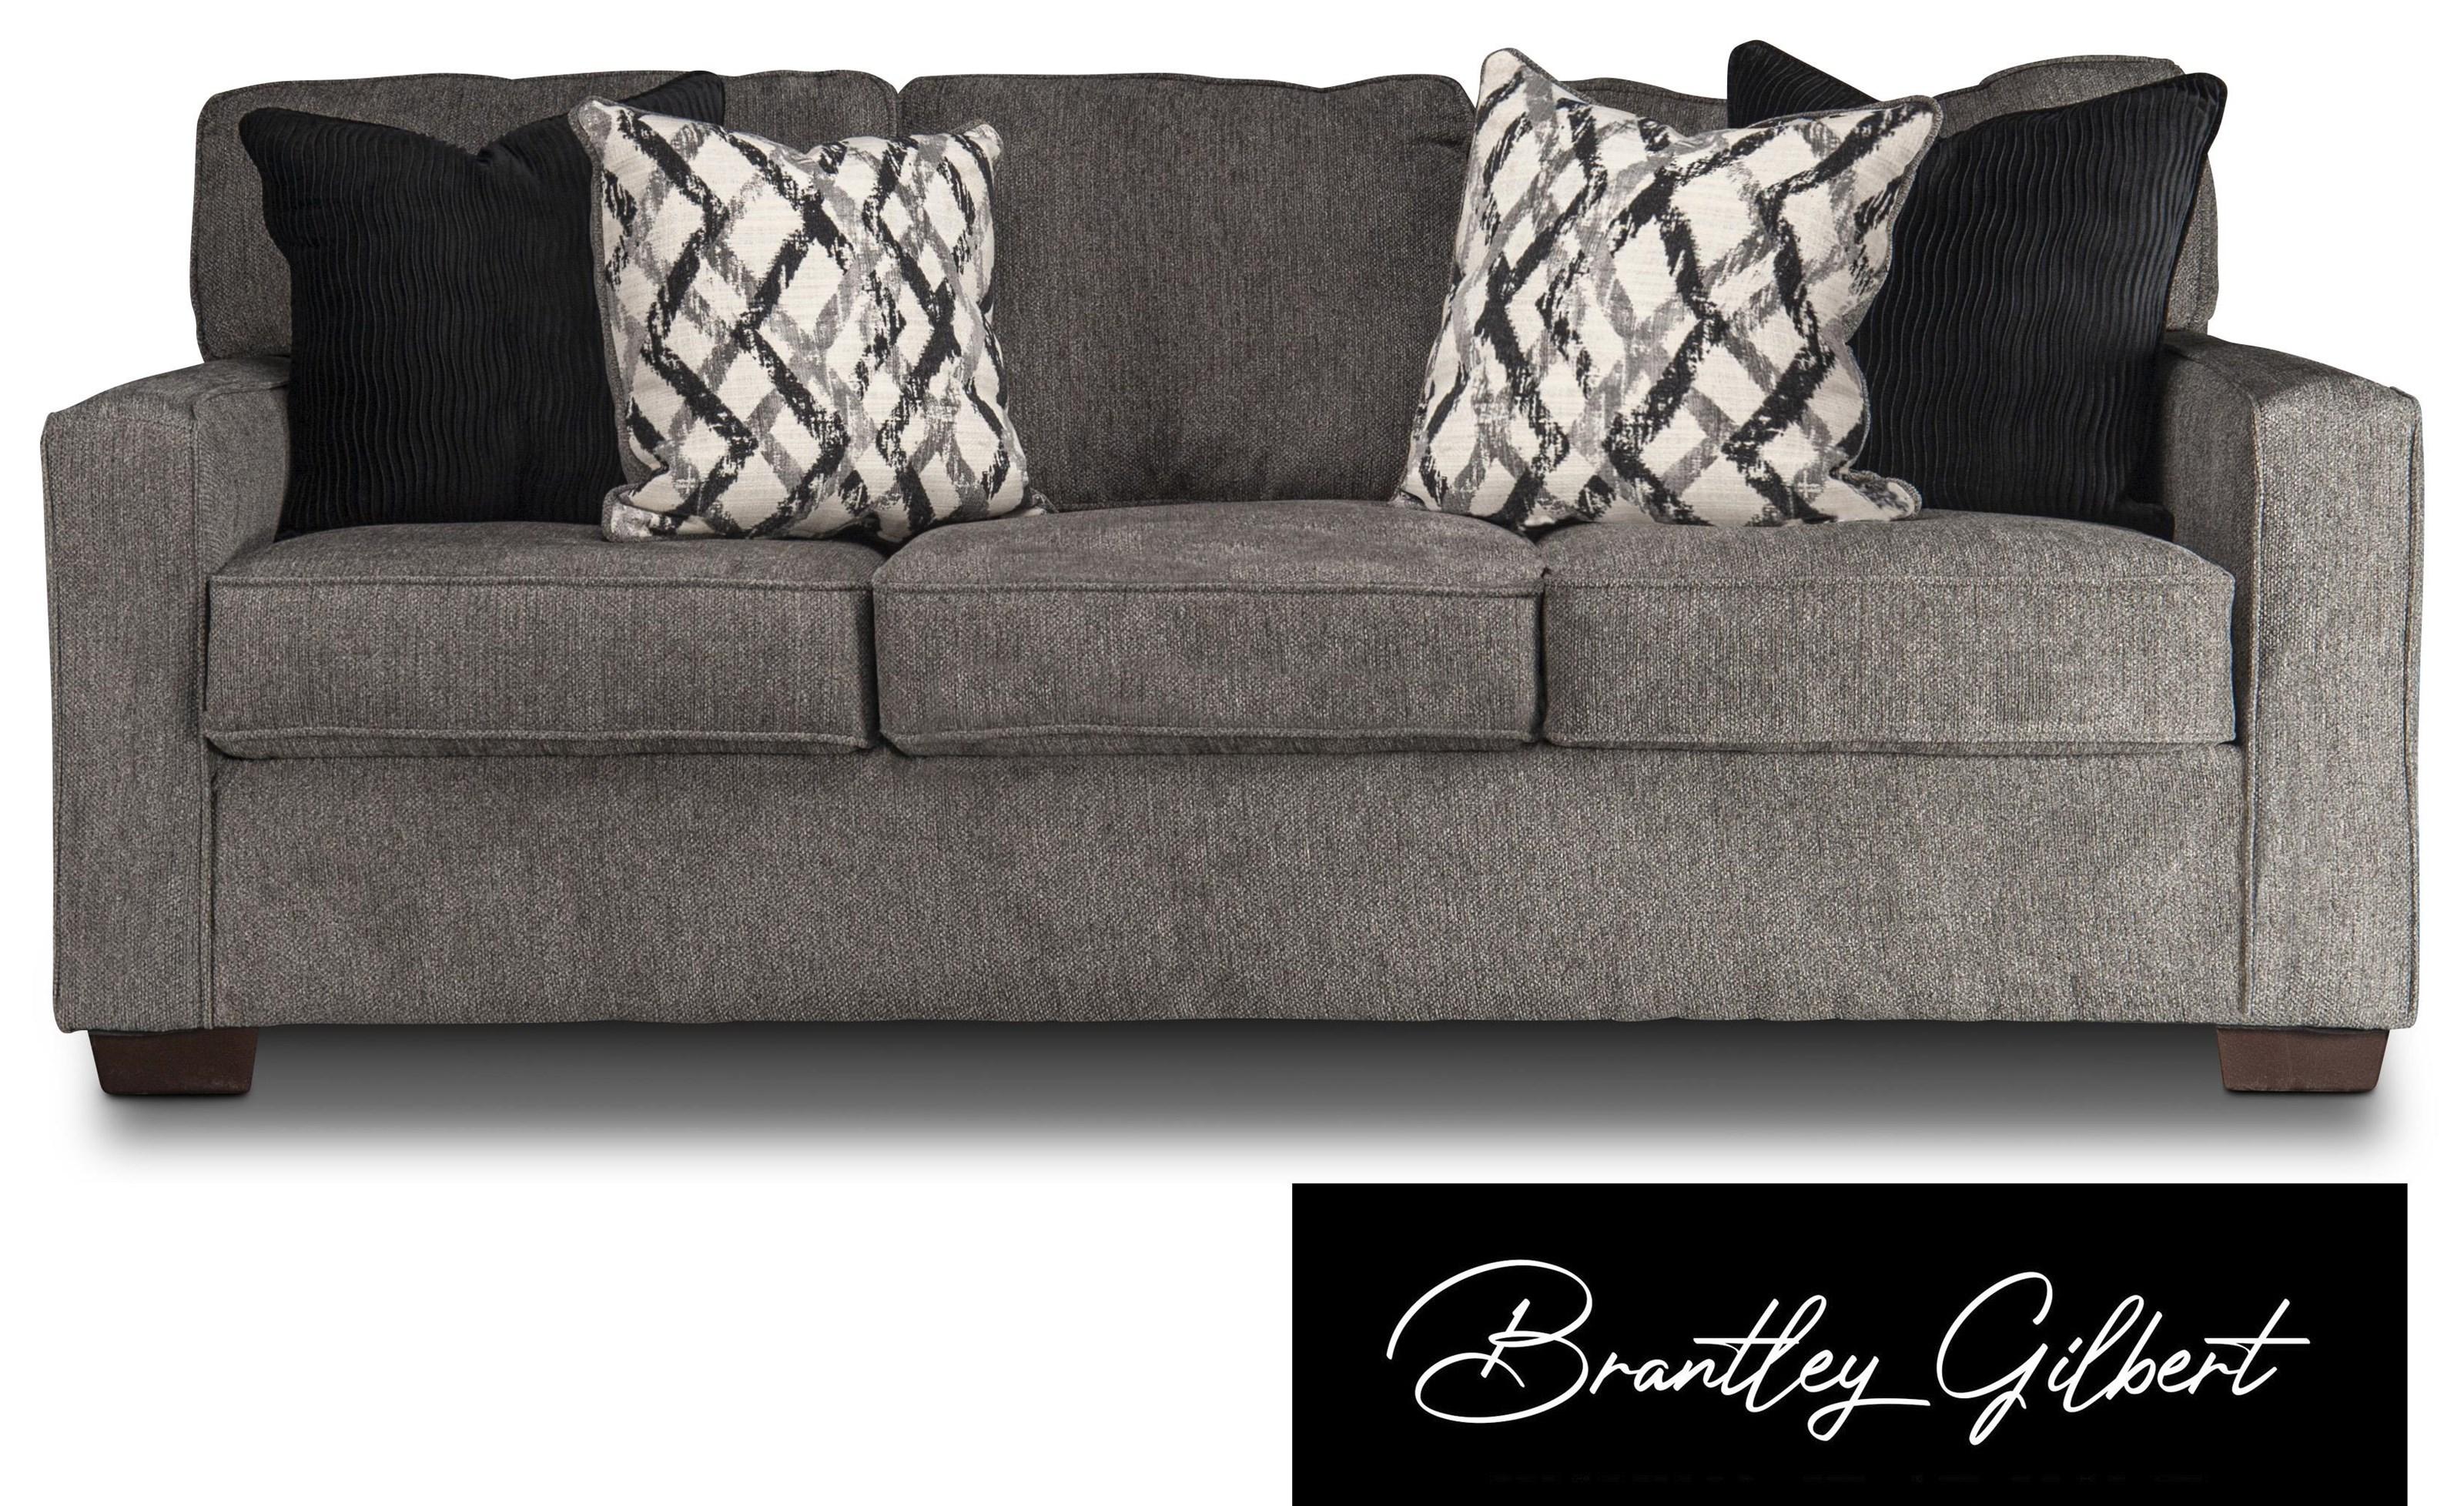 Putnam Putnam Sofa by Peak Living at Morris Home